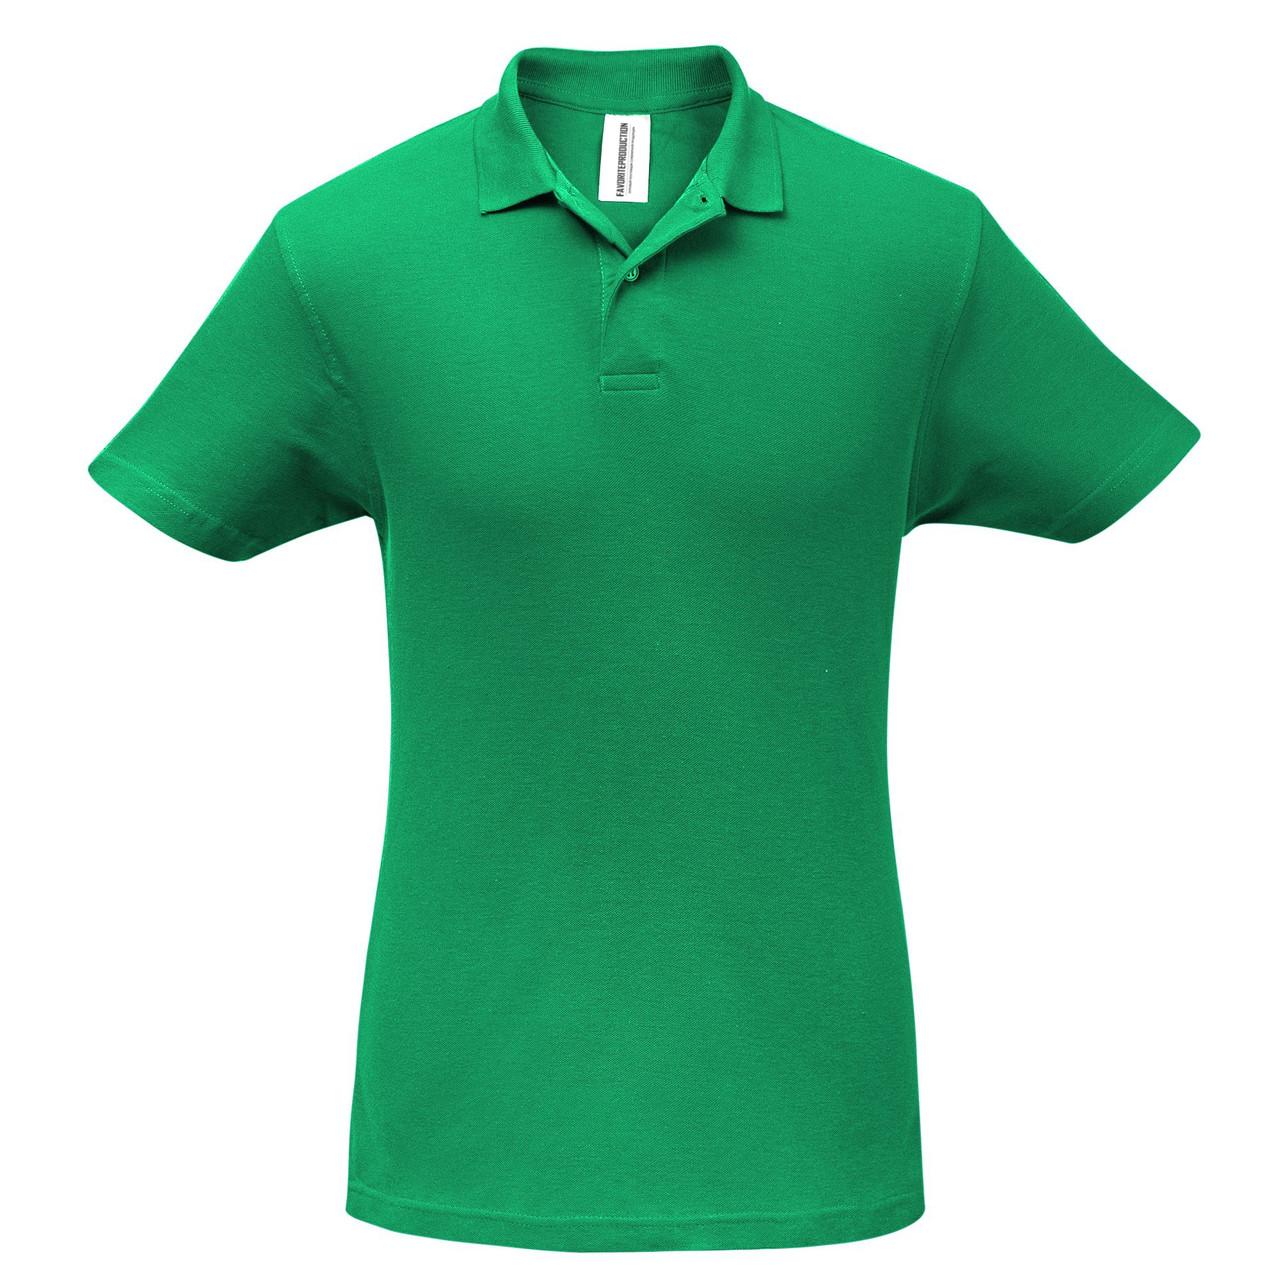 Футболка Поло Зеленая.200 гр.XS